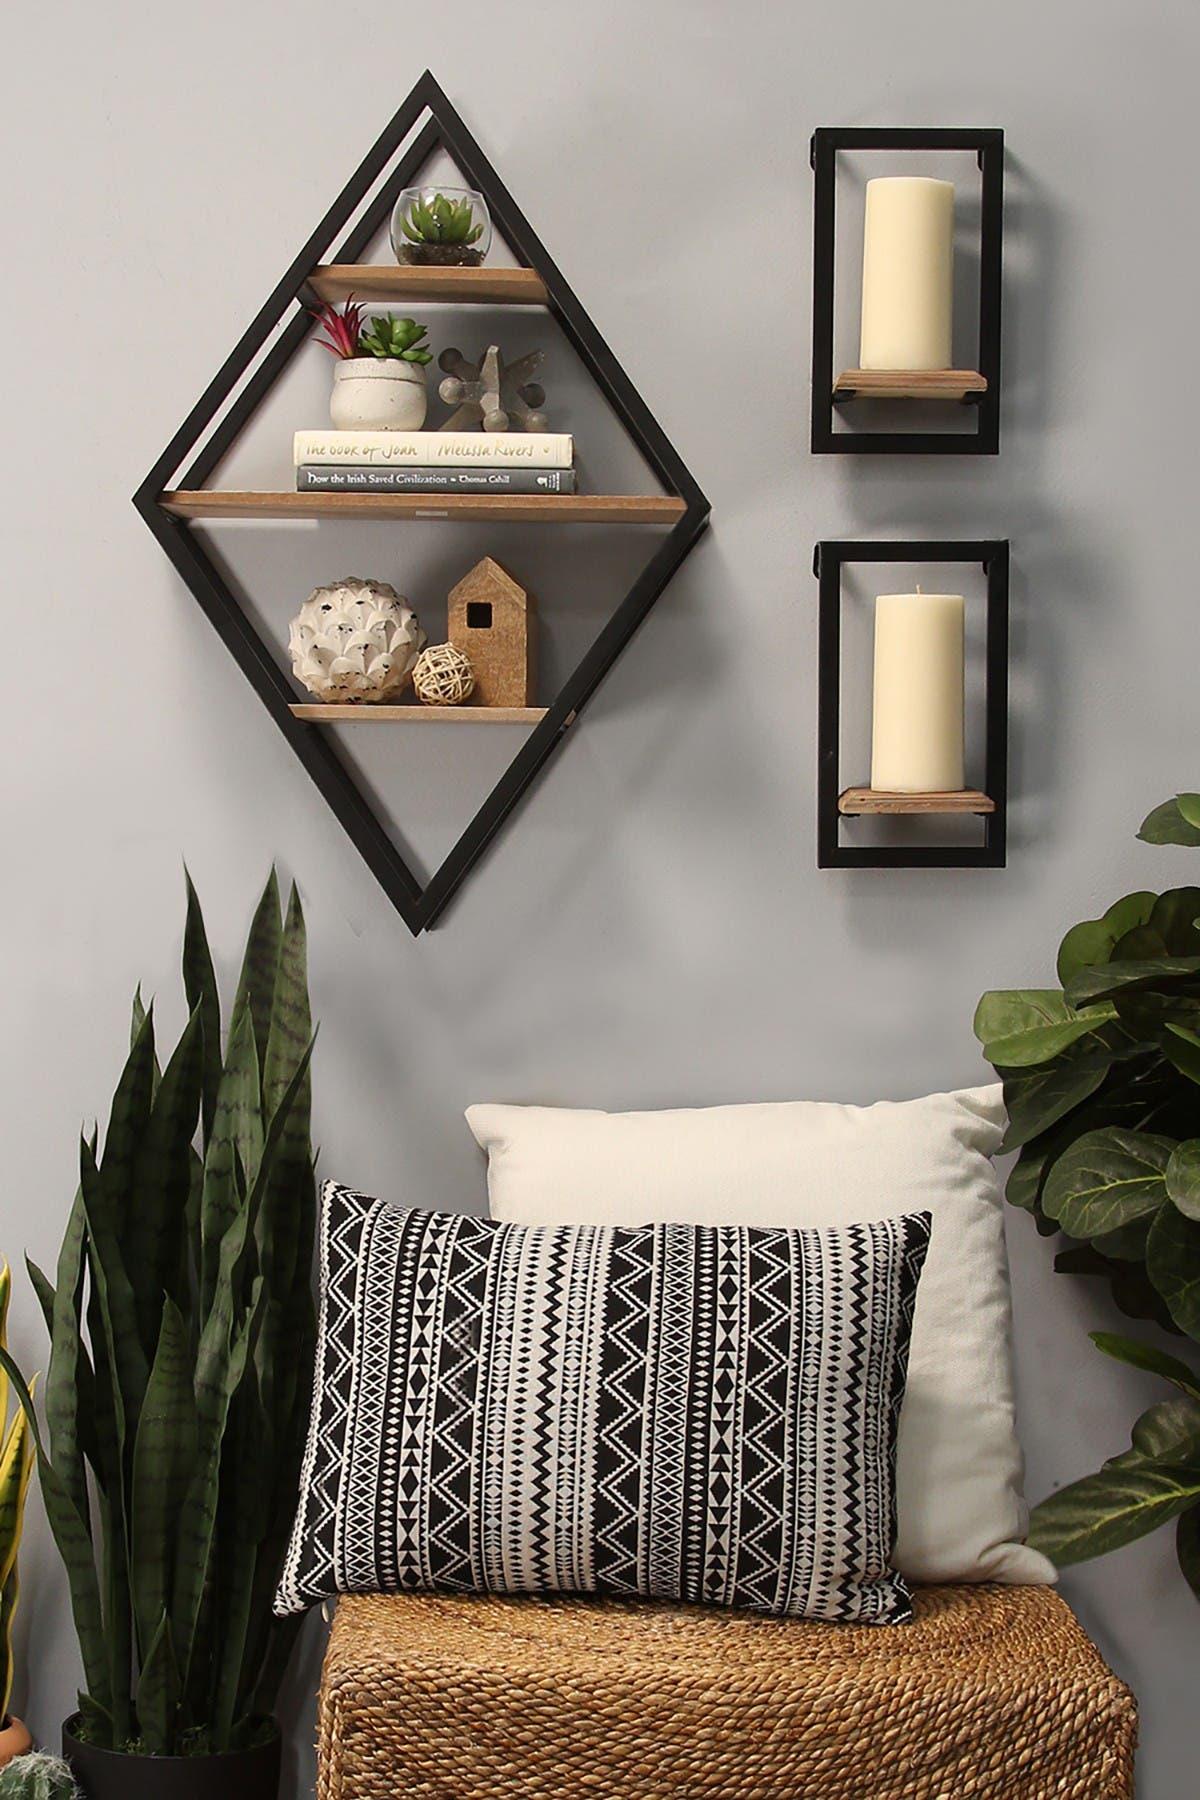 Stratton Home Natural Wood Black Diamond Shelf Wall Decor Nordstrom Rack